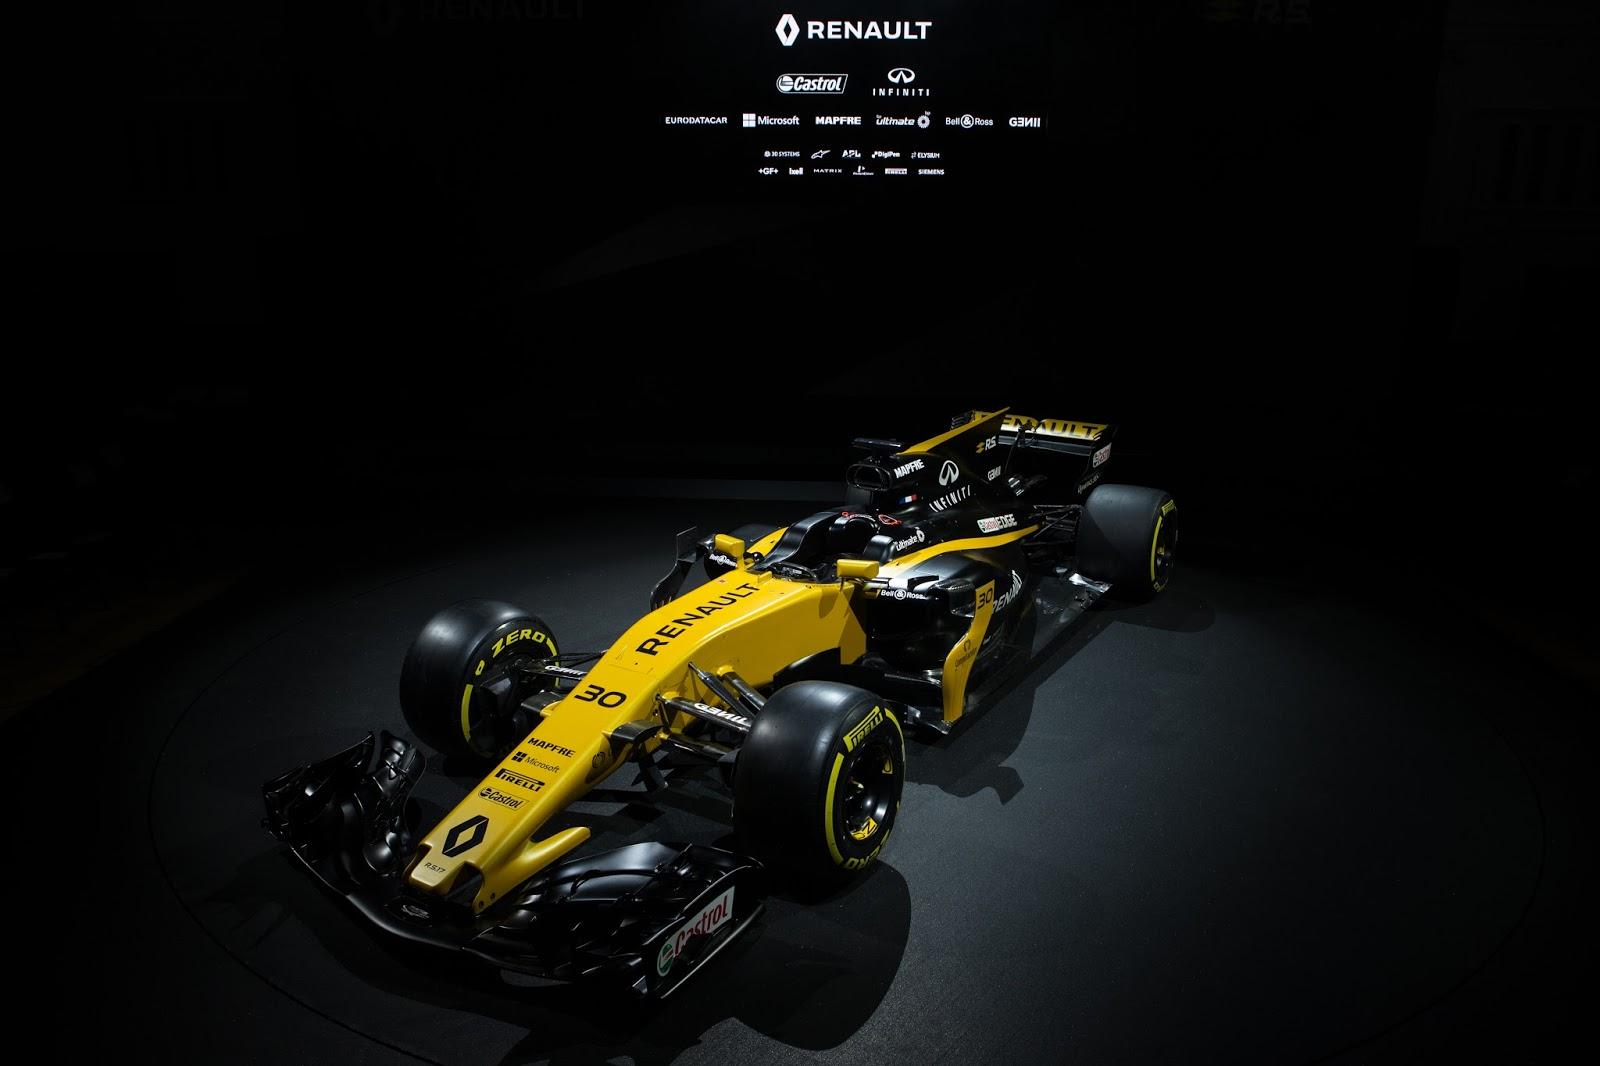 210217 RL 006 1 Η Renault Sport παρουσίασε το καινούργιο της μονοθέσιο, την R.S.17 F1, Formula 1, Renault, Renault Sport Formula 1 Team, videos